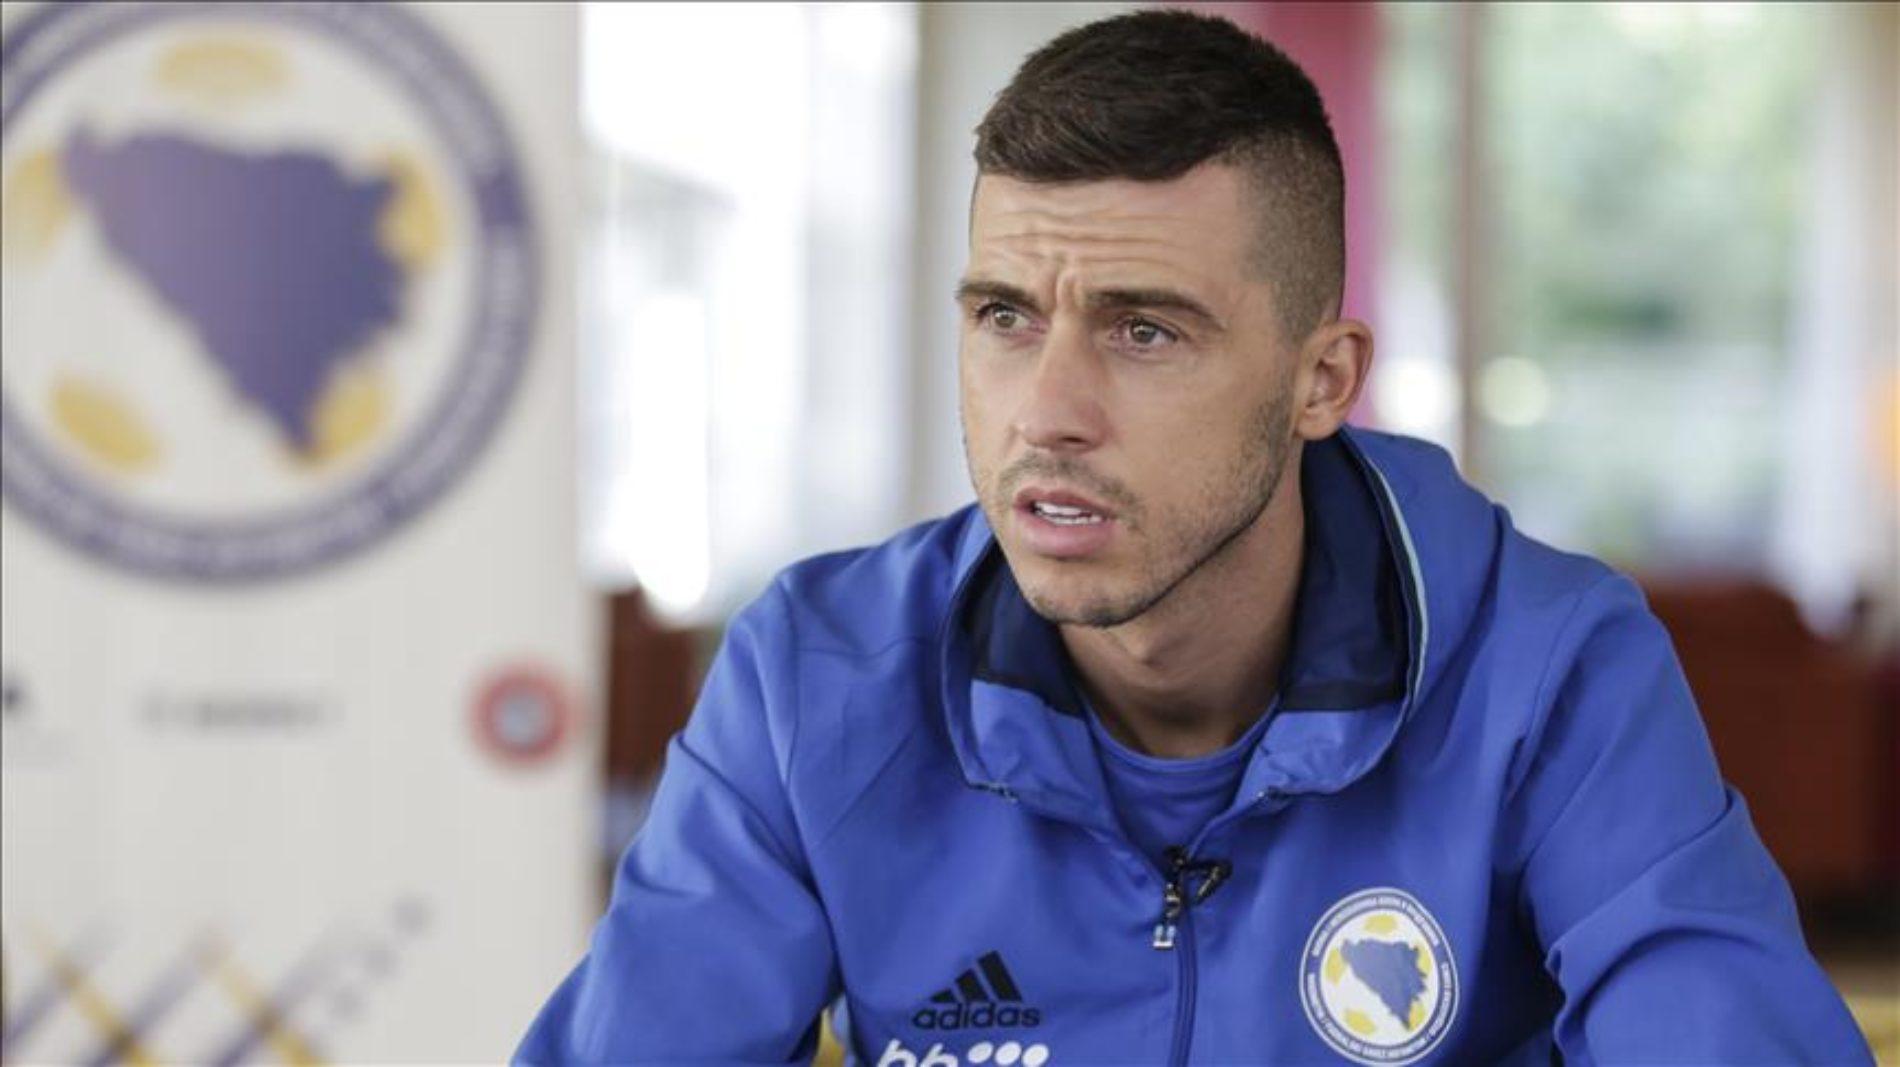 Medunjanin: Želimo da odemo na Svjetsko prvenstvo 2018.